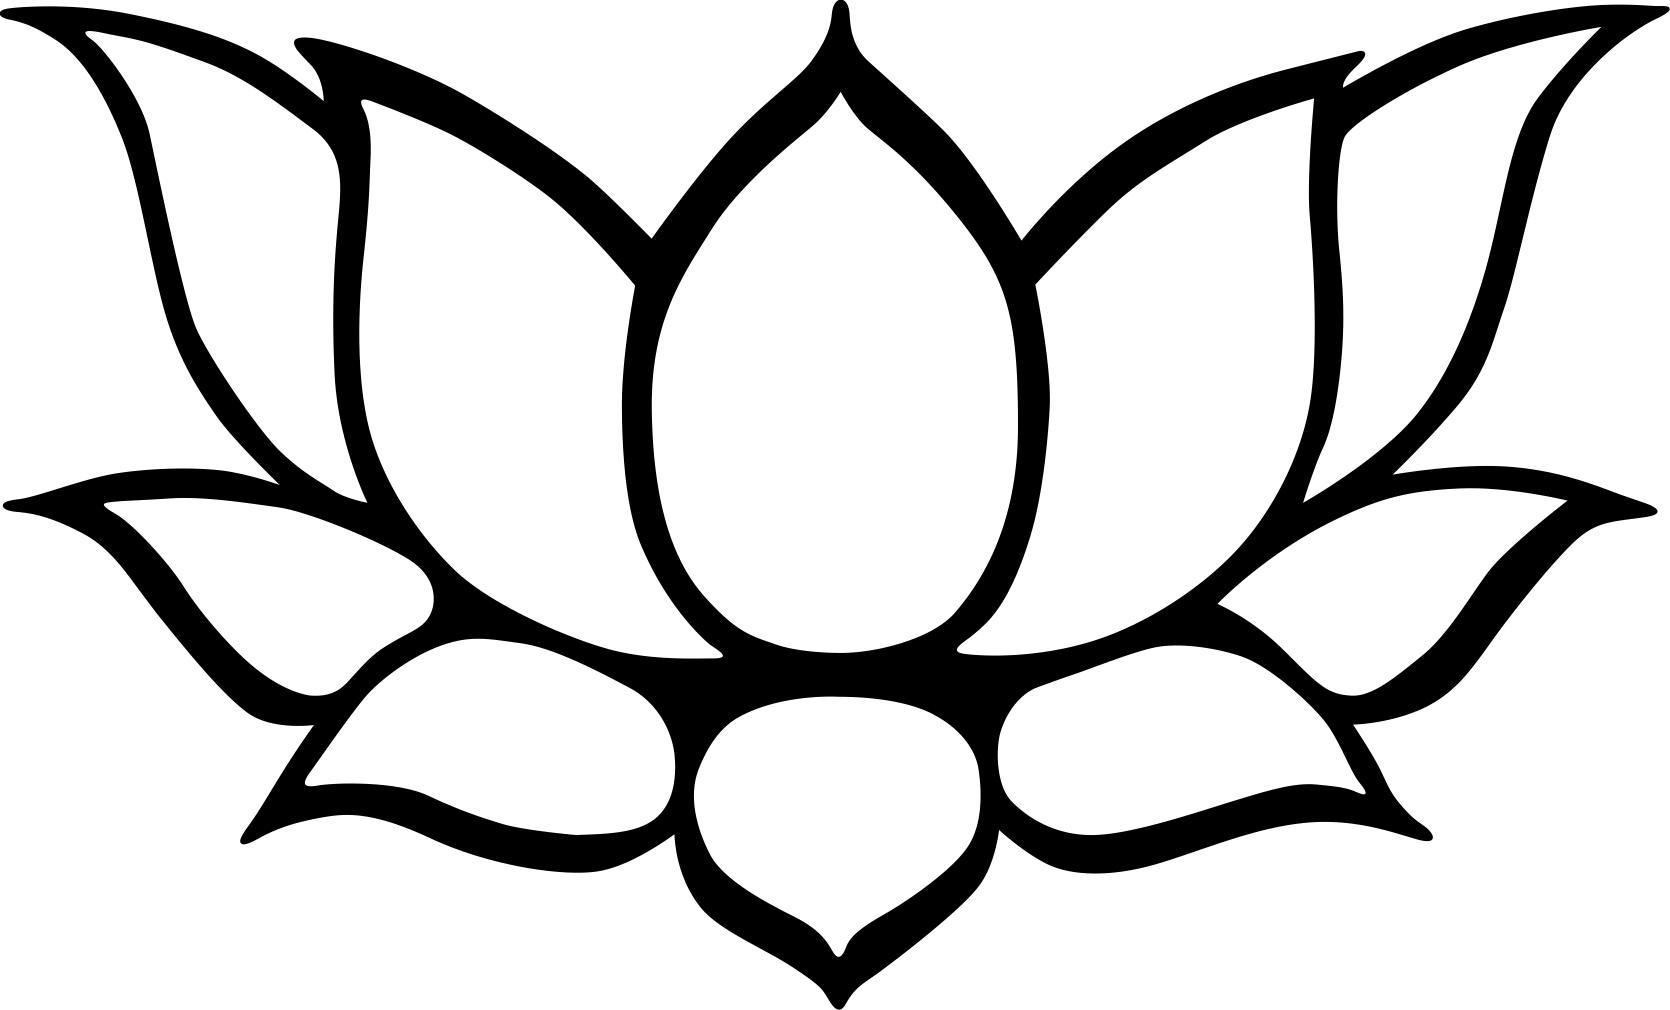 Free Lotus Clipart Download Free Clip Art Free Clip Art